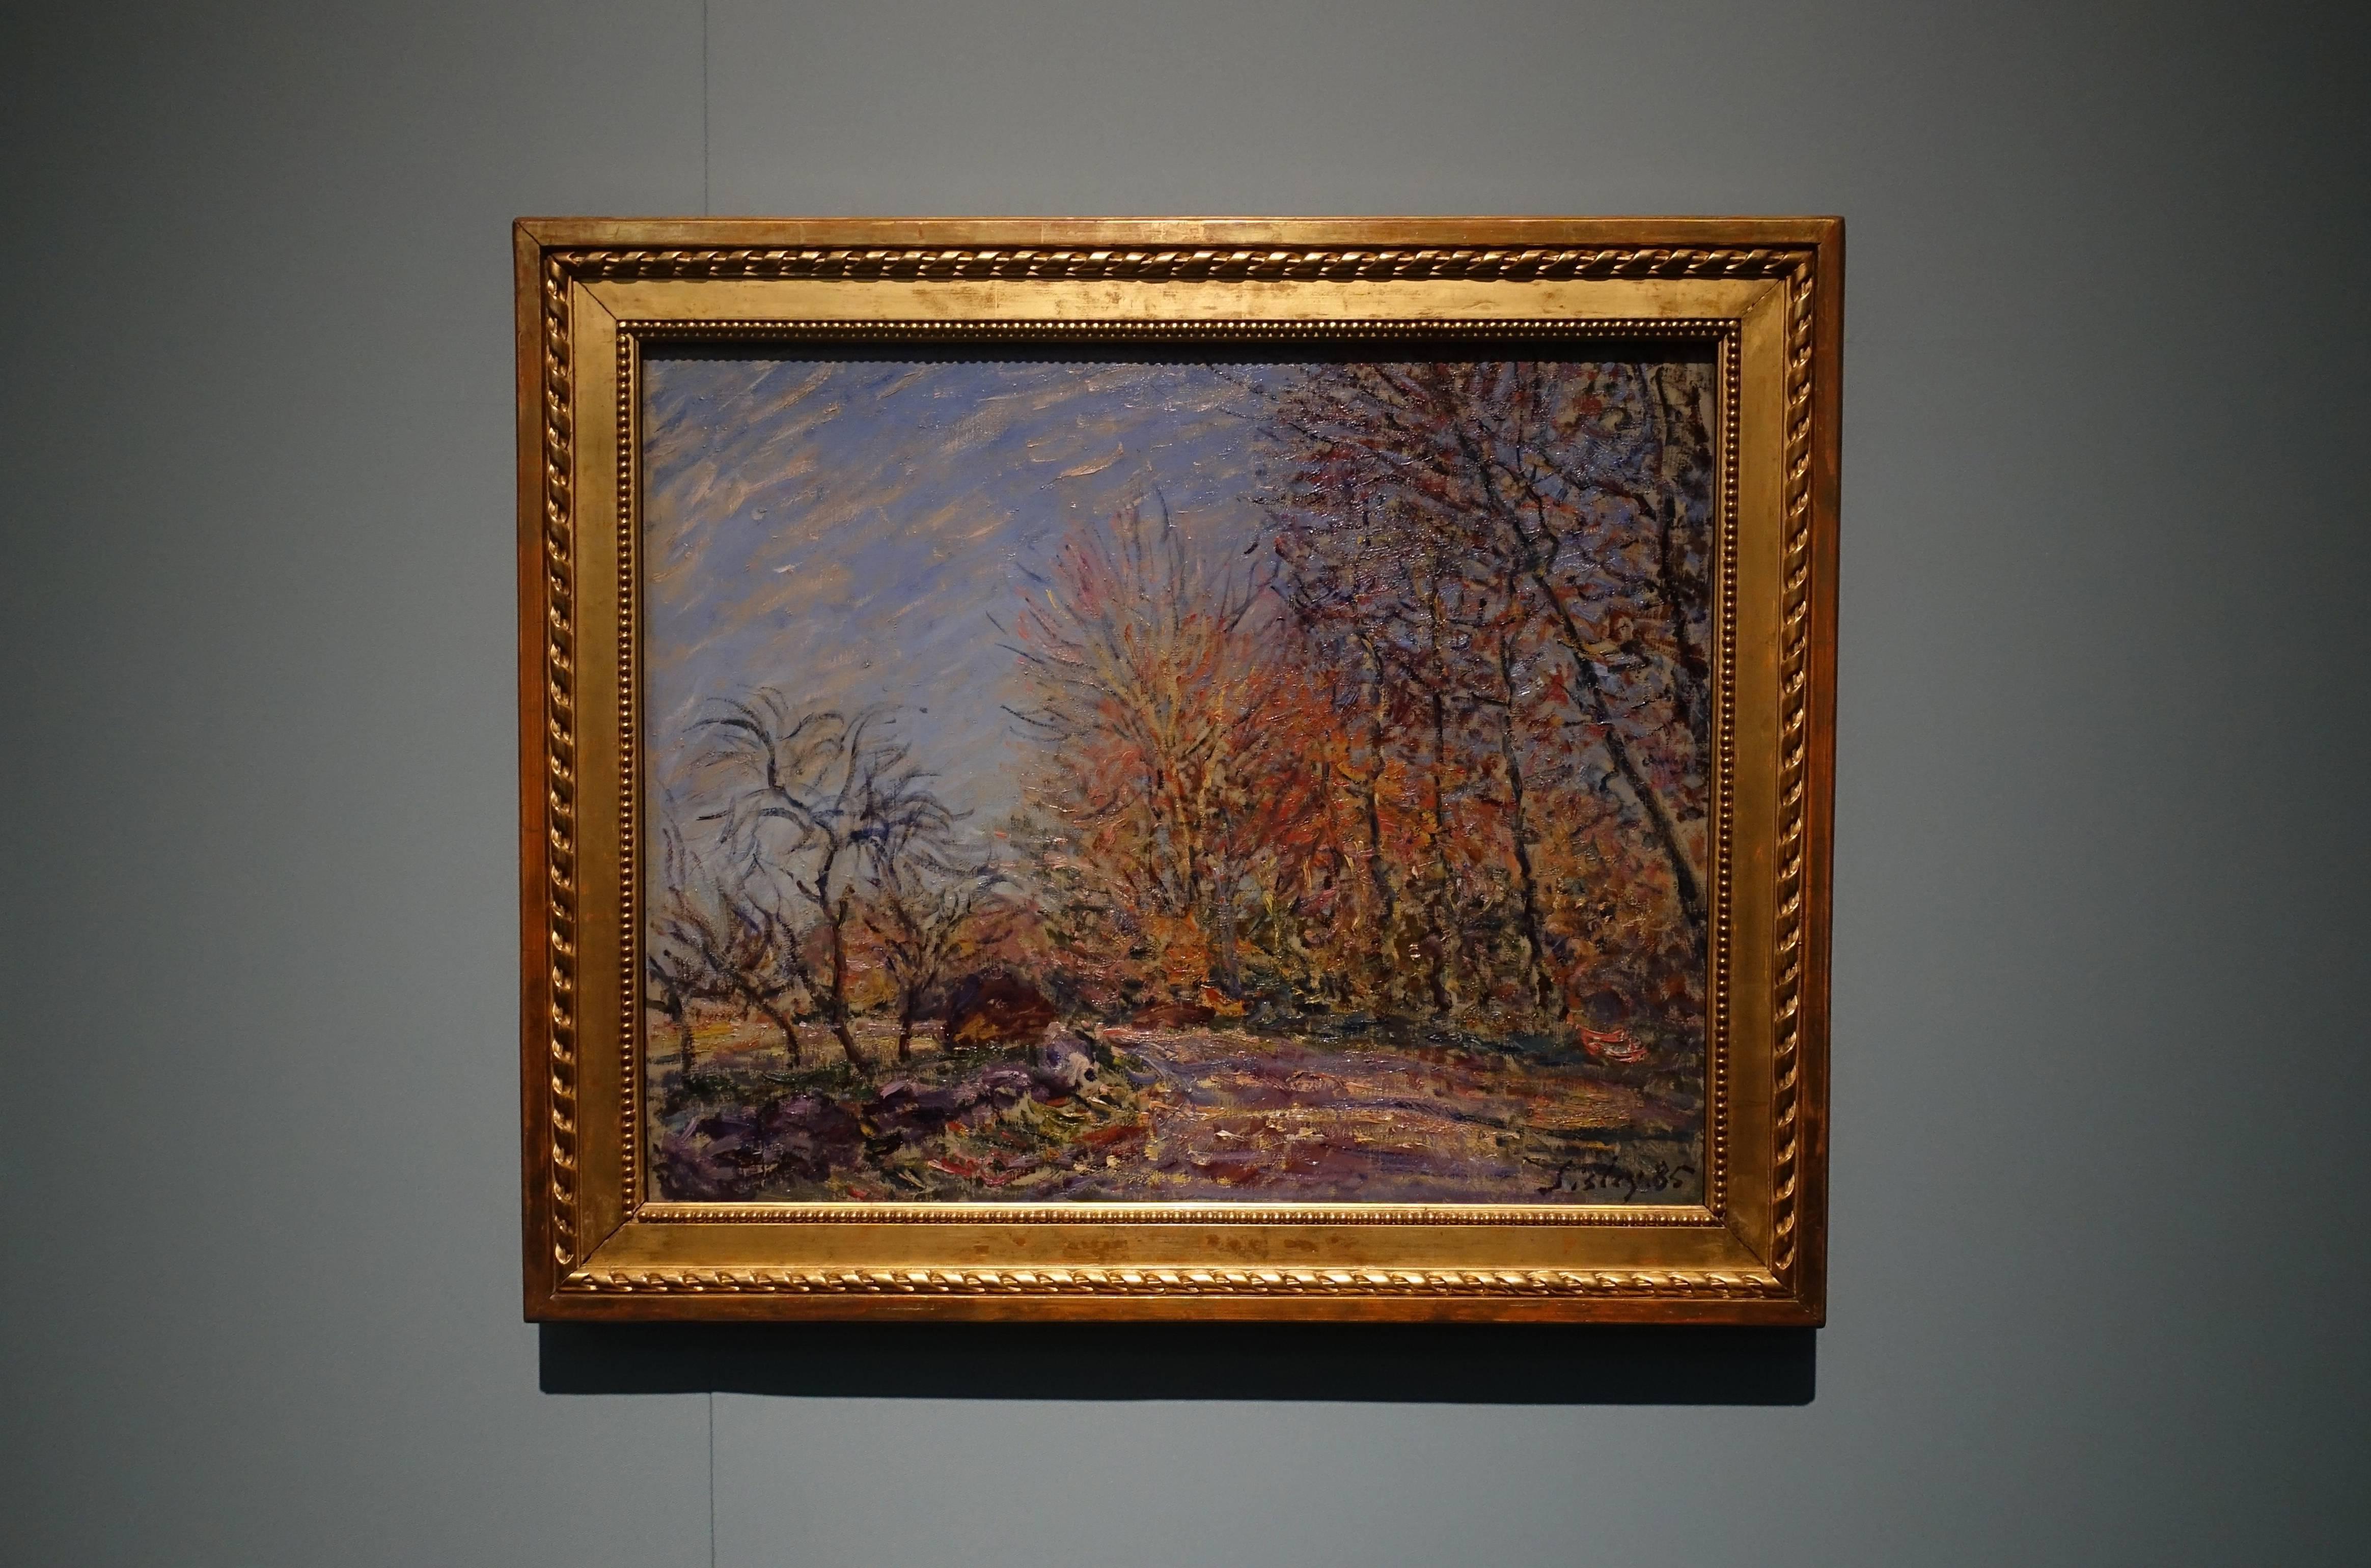 阿爾弗雷德•希斯萊 Alfred Sisley ,《楓丹白露森林邊際 Edge of the Forest of Fontainebleau》,油彩、畫布 Oil on canvas,1885。